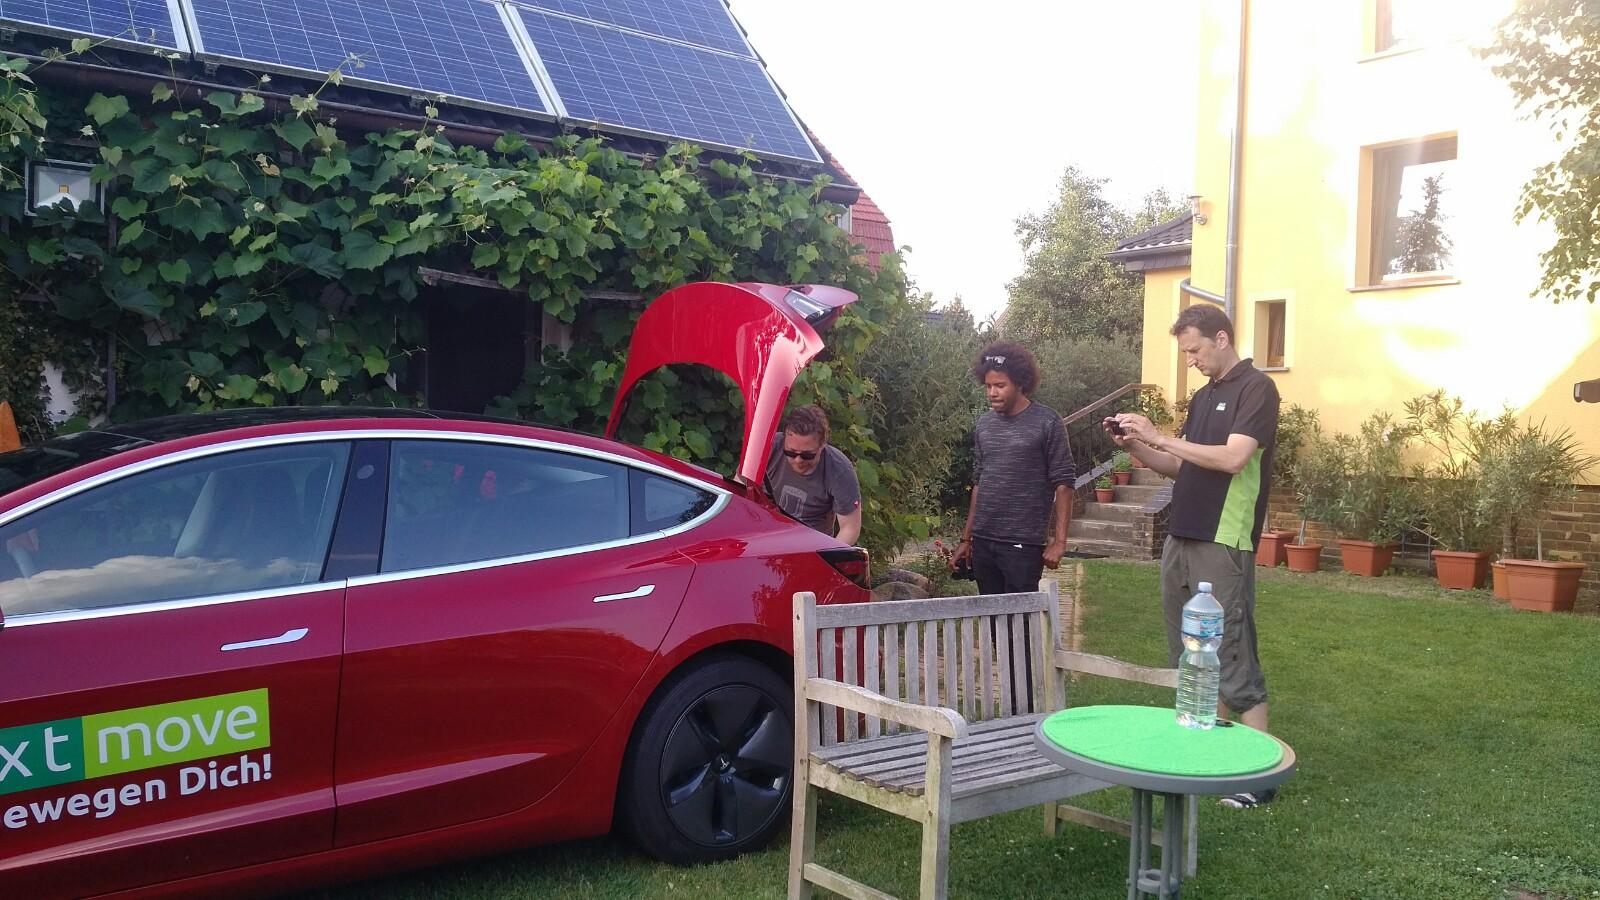 nextmove Tesla Model 3 Elektrisiert Alex Bild 1